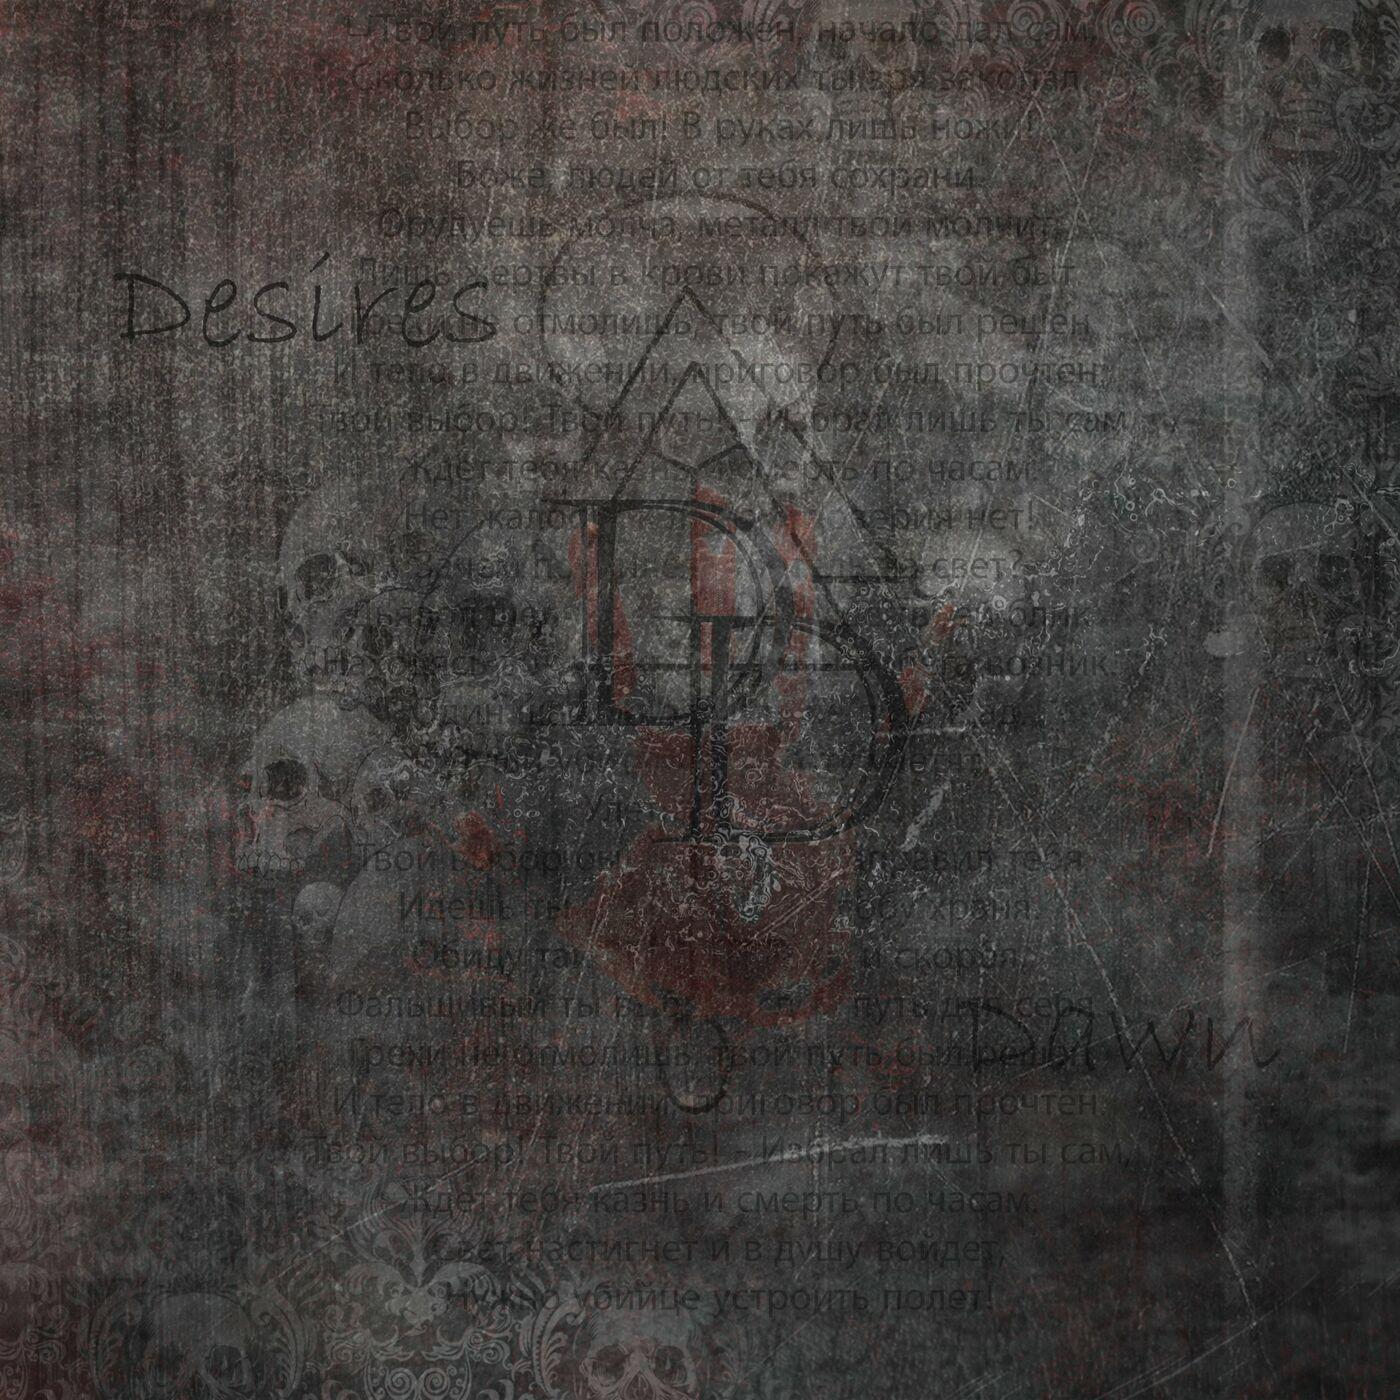 Desires Dawn - Твой путь [single] (2021)